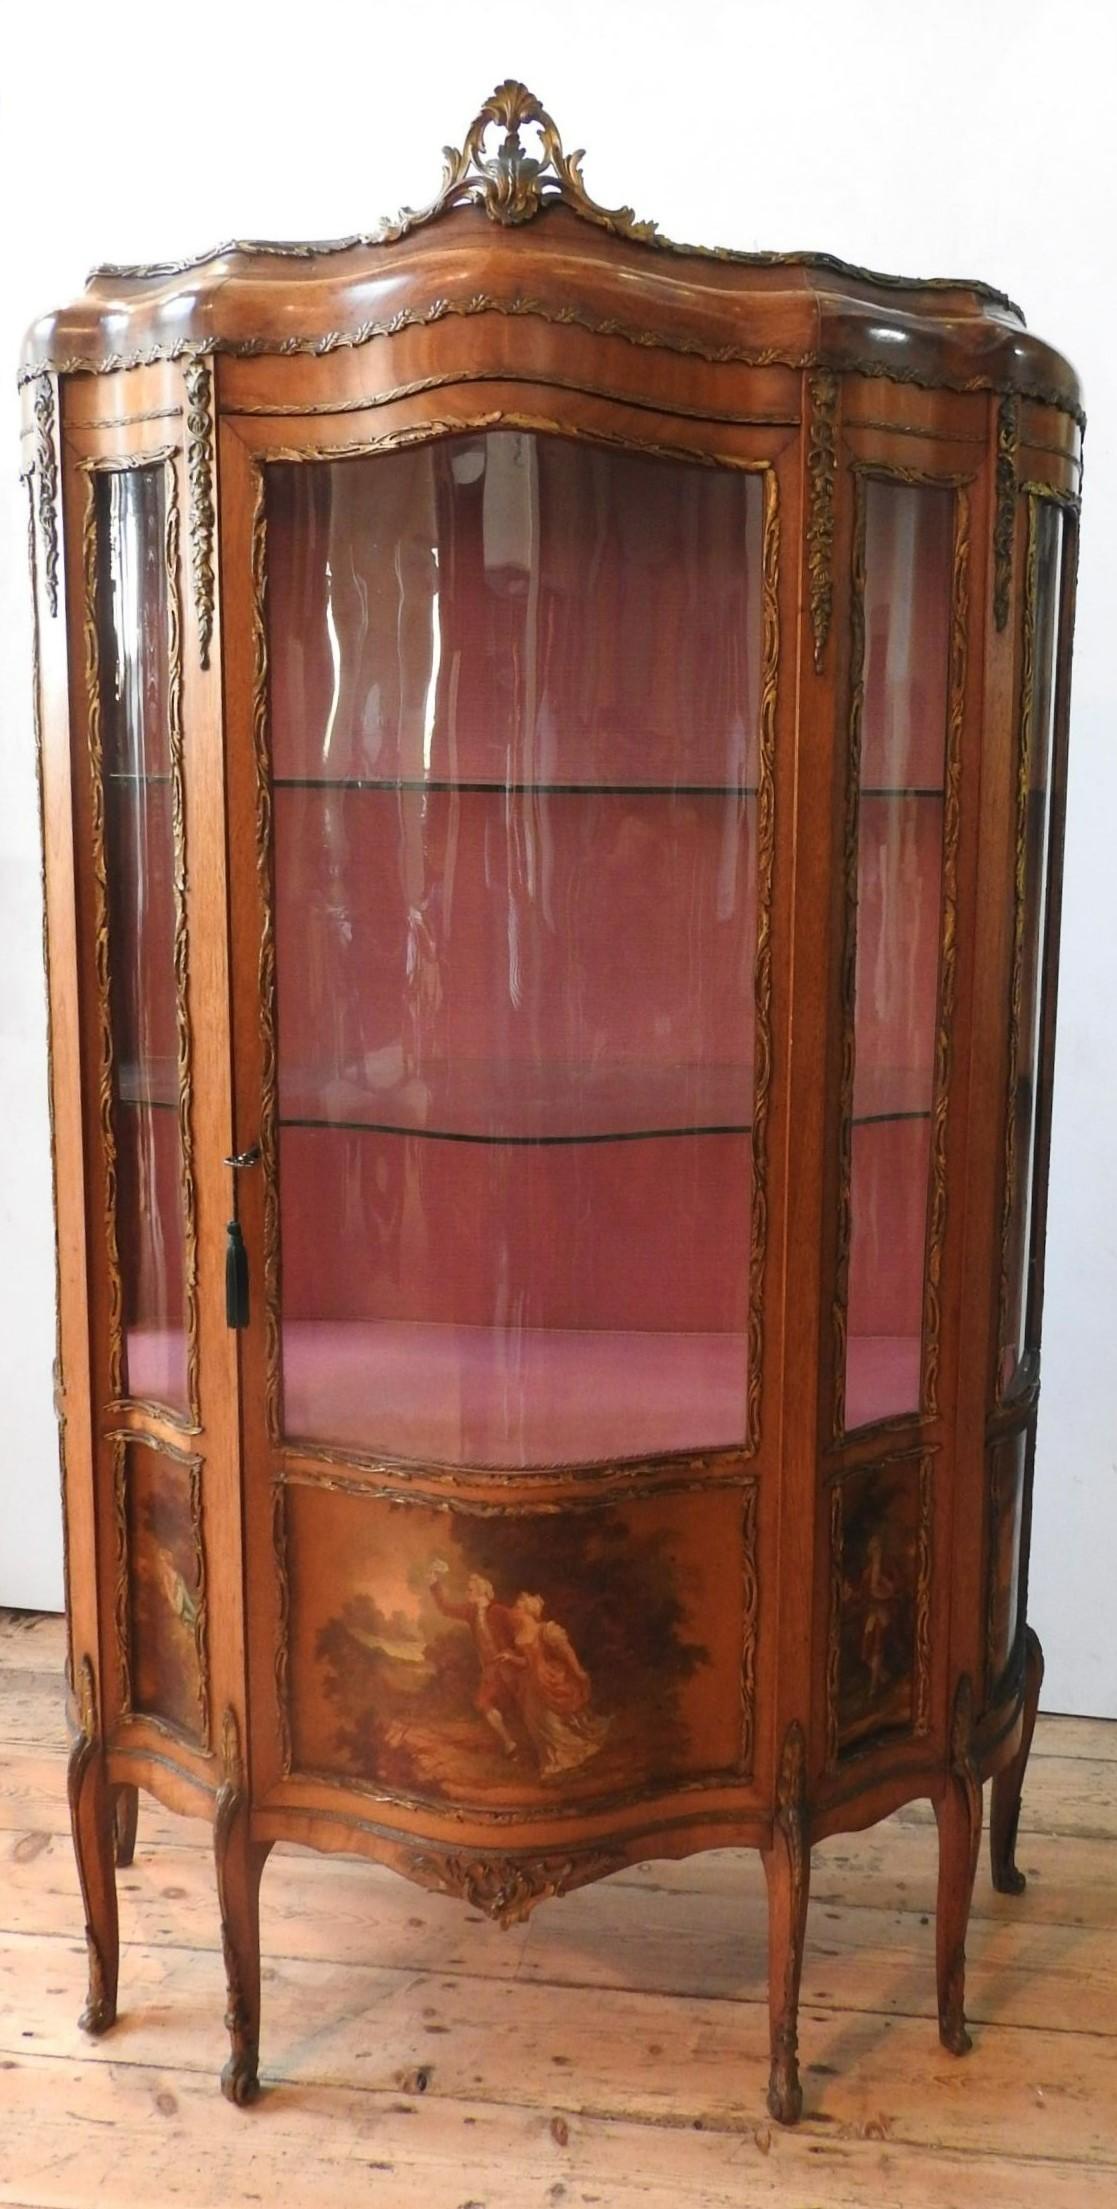 AN ORNATE 20TH CENTURY LOUIS XV STYLE WALNUT VENEER VETRINE CABINET, the serpentine fronted